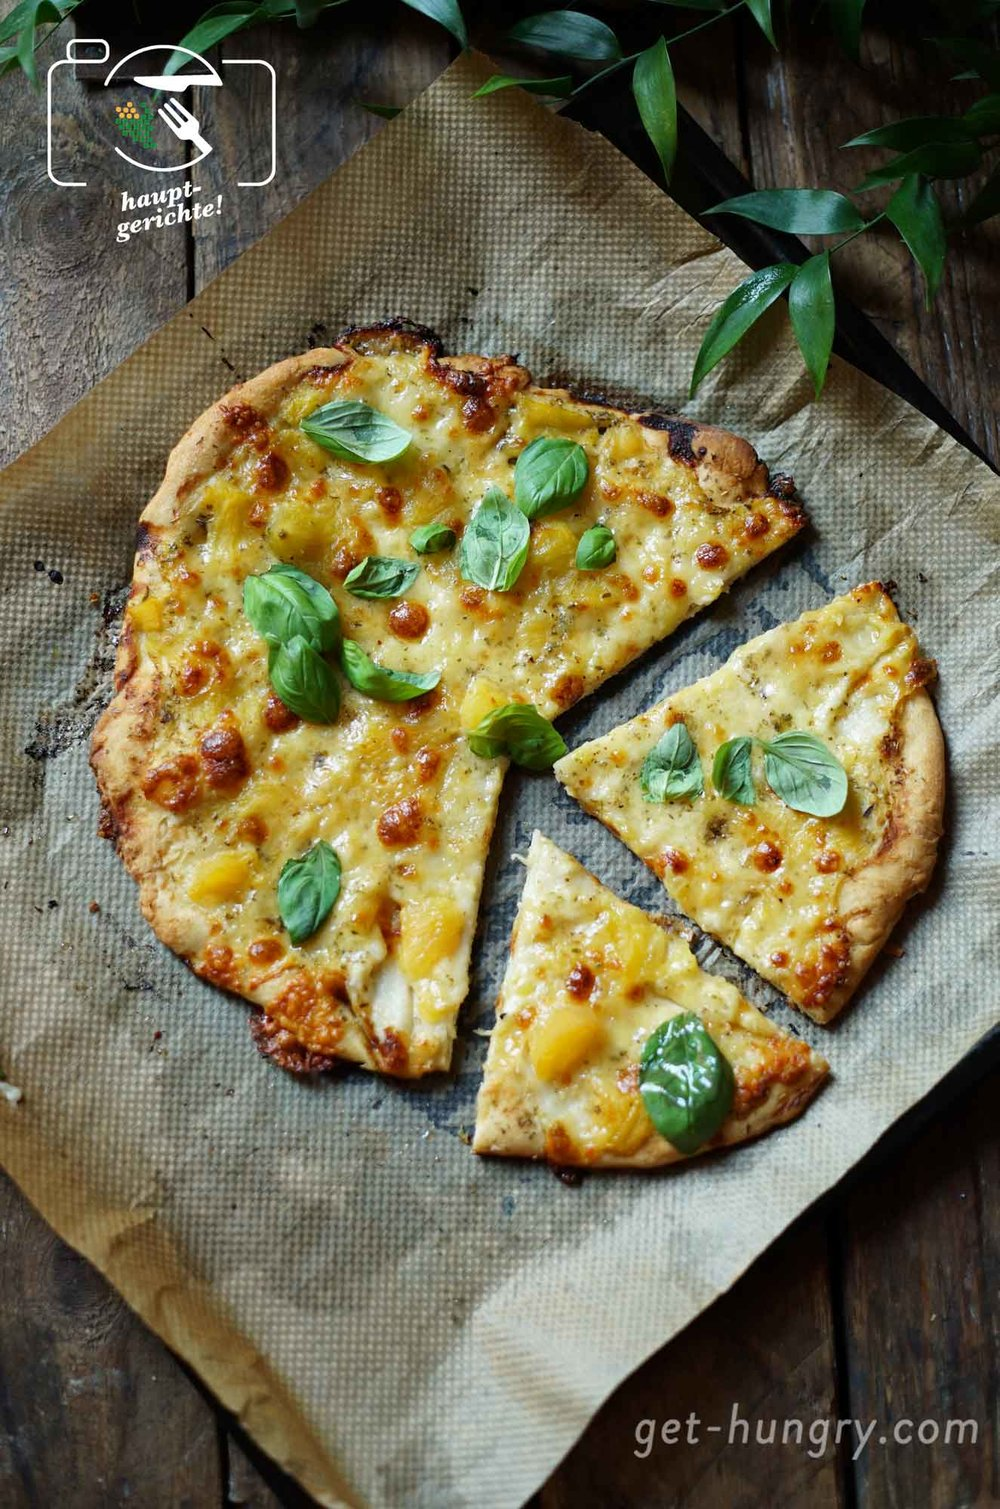 Selbst gebackene Pizza: Yellow Margherita und Pizza Neapolitana - Klassiker so gut wie beim Italiener